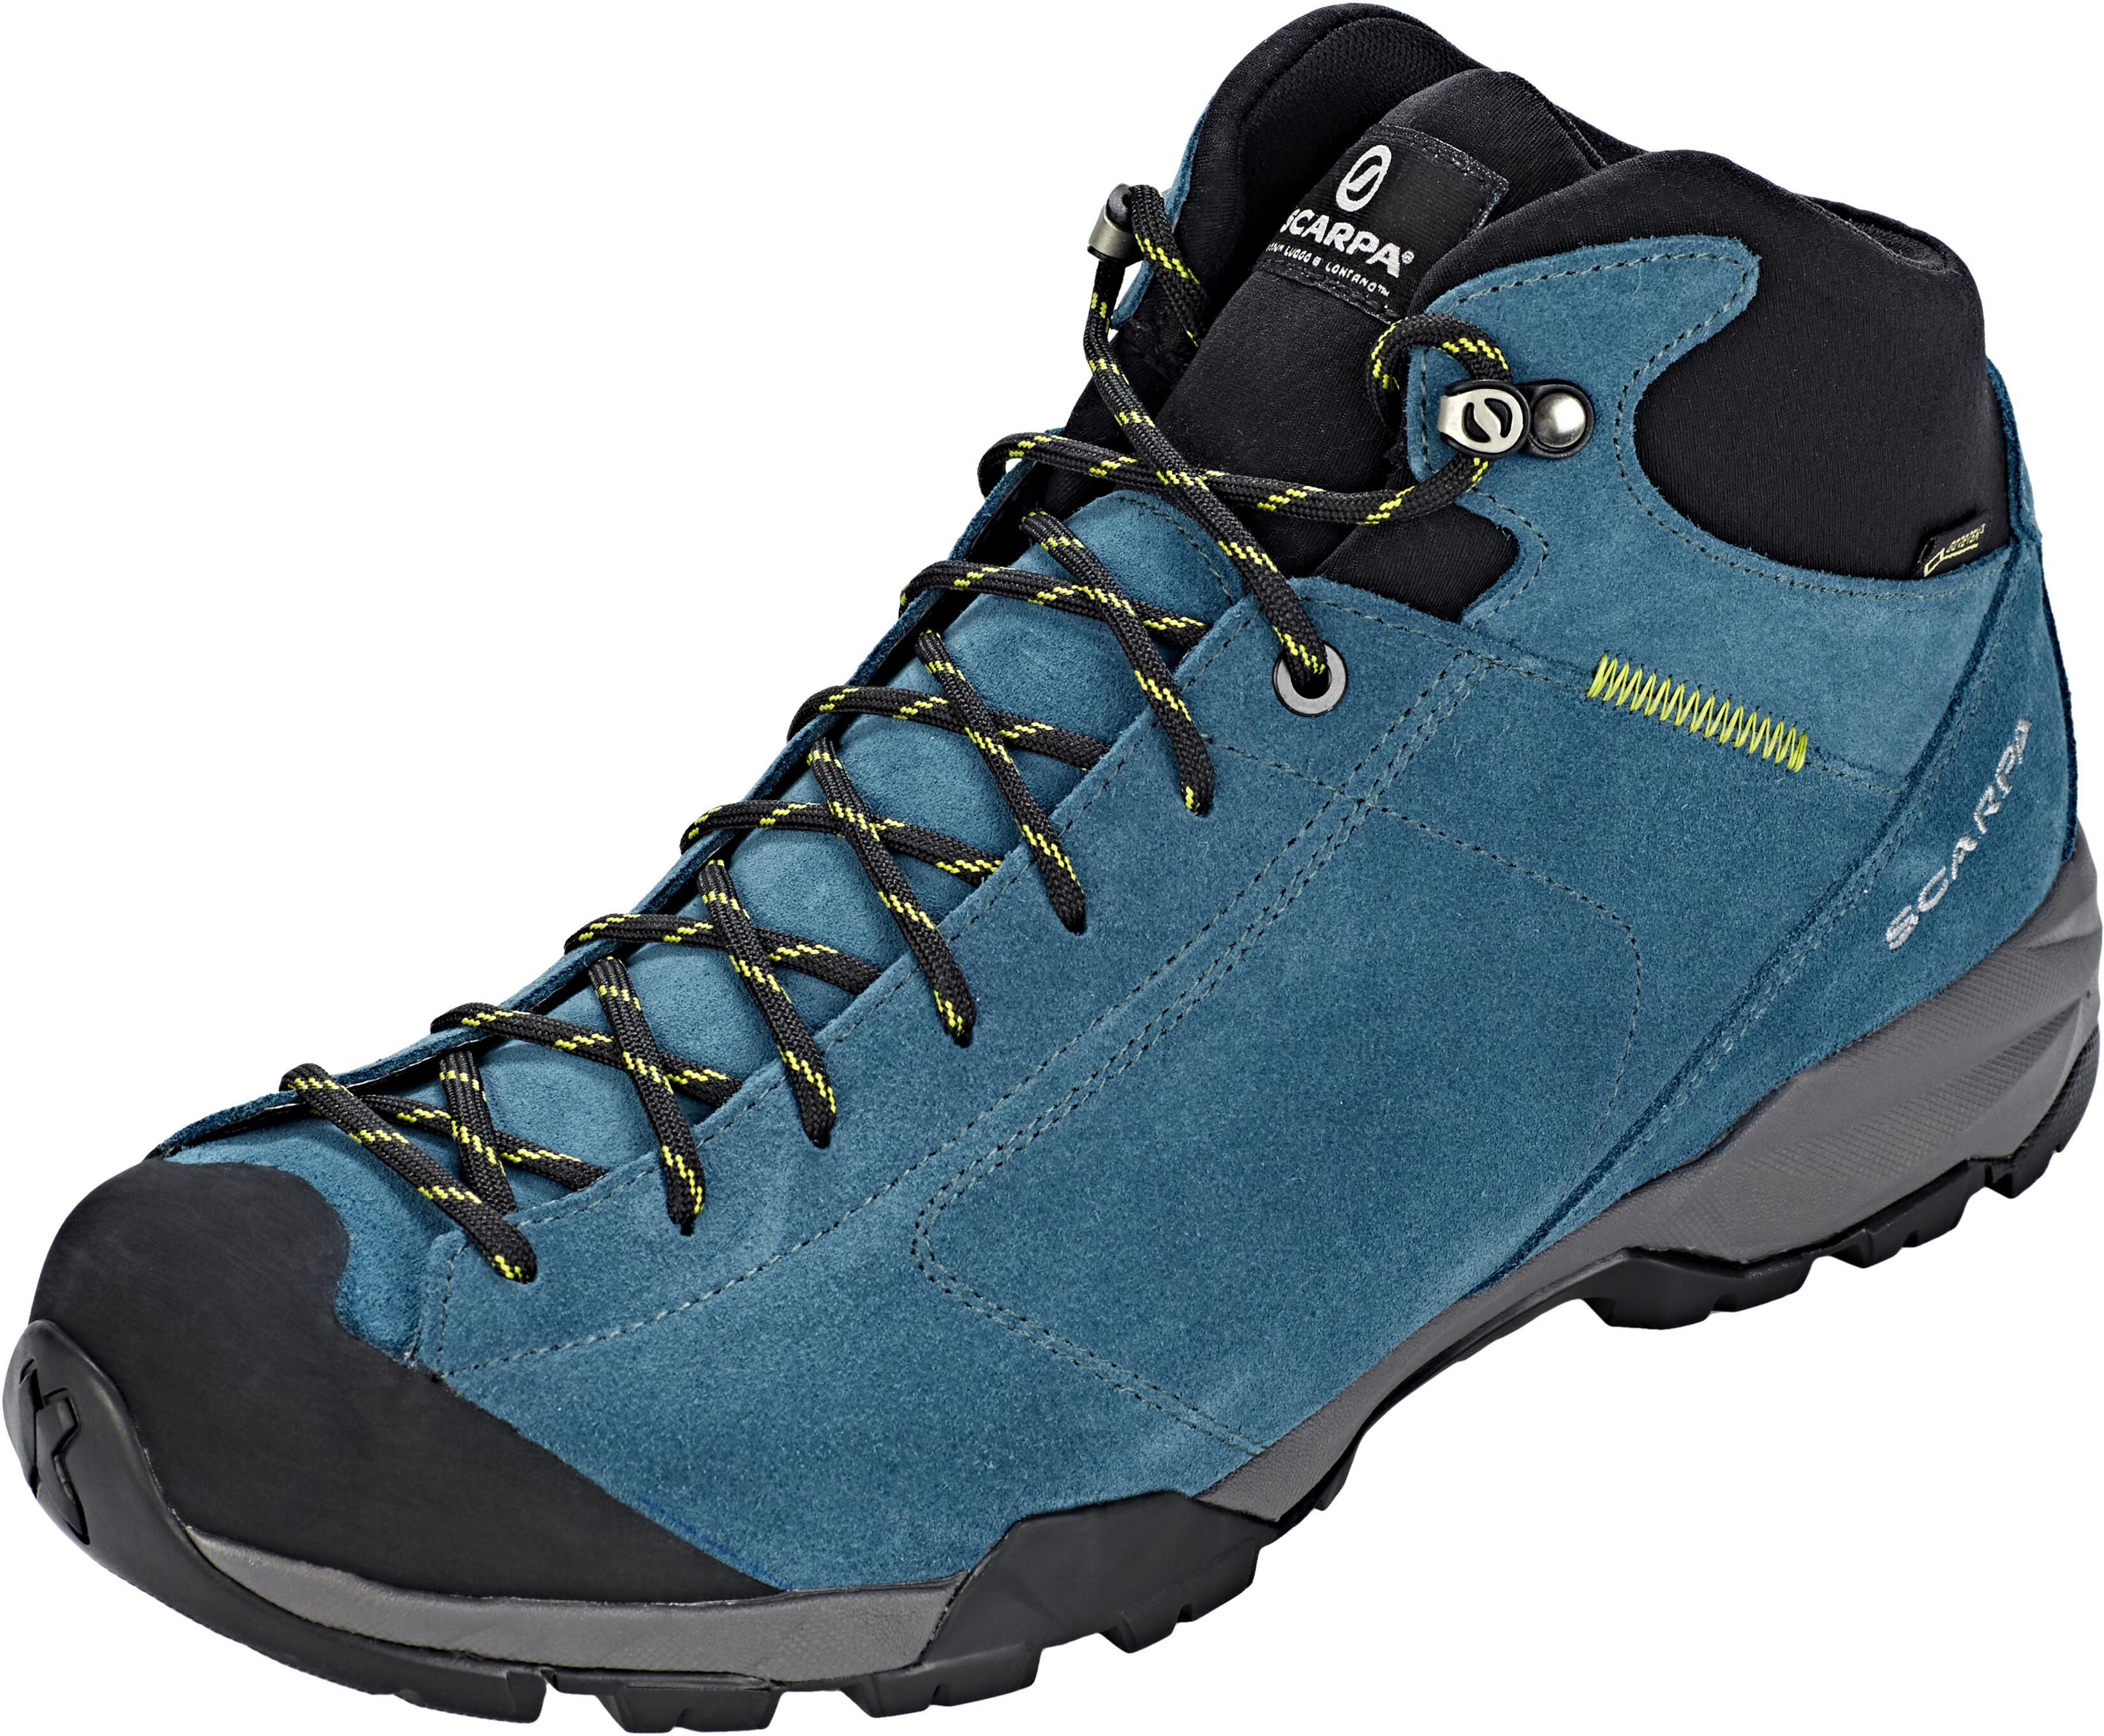 2468671eee4 Scarpa Mojito Hike GTX Shoes Men blue black at Addnature.co.uk